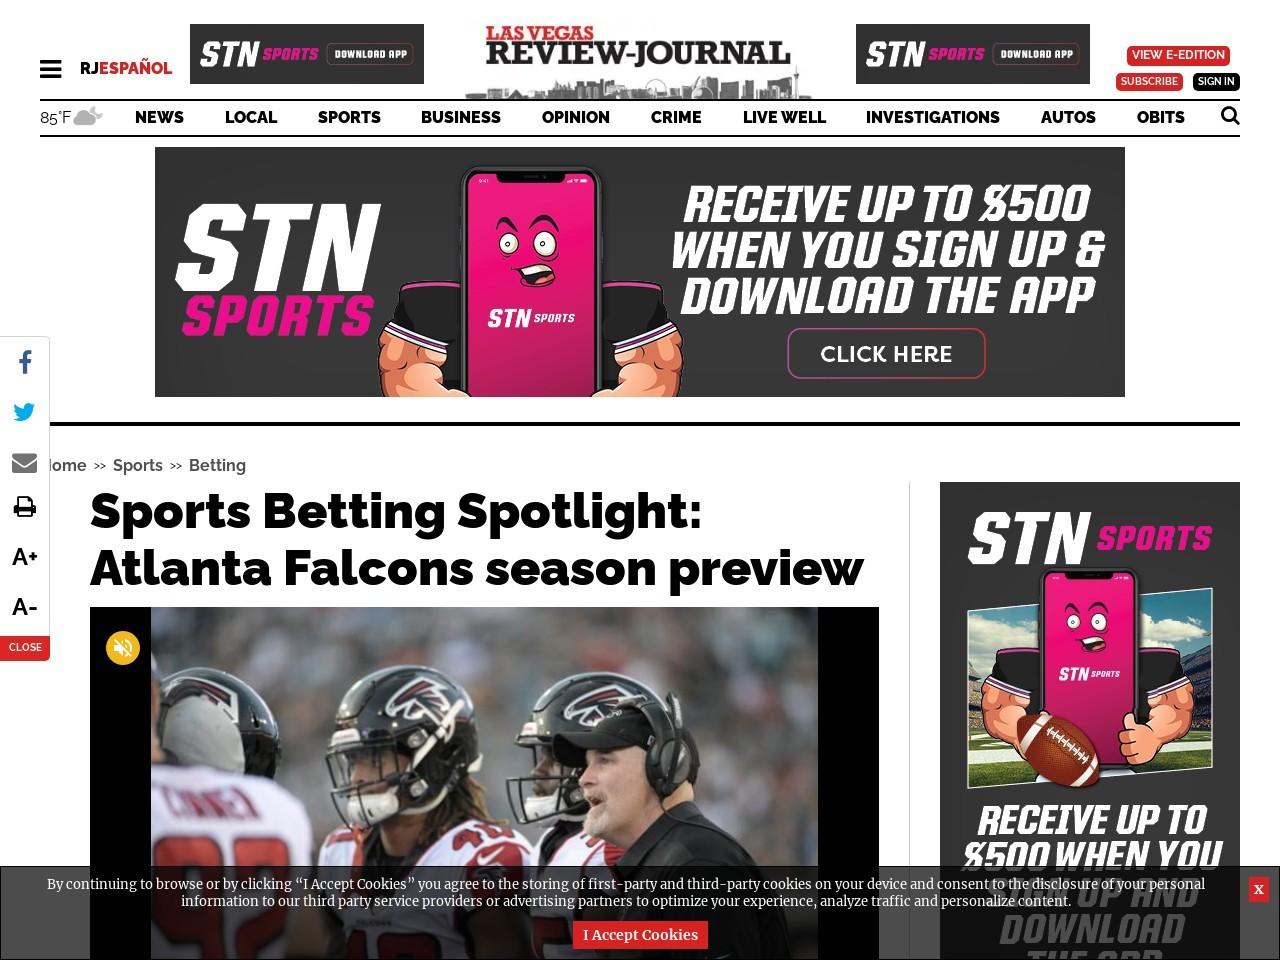 Sports Betting Spotlight: Atlanta Falcons season preview